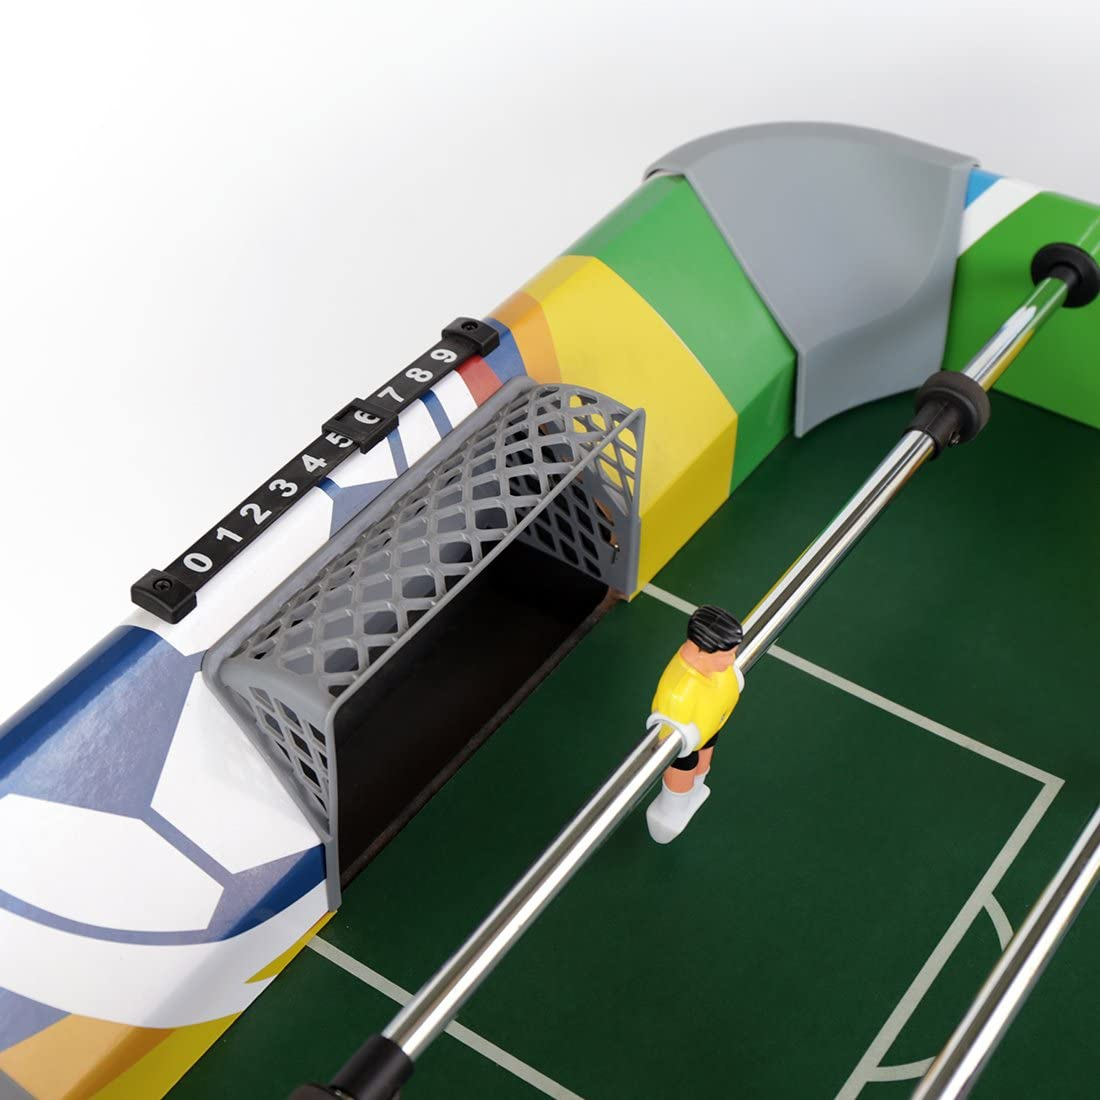 Juego de 4 ft deporte fútbol mesa, mesa de fútbol, 47.75